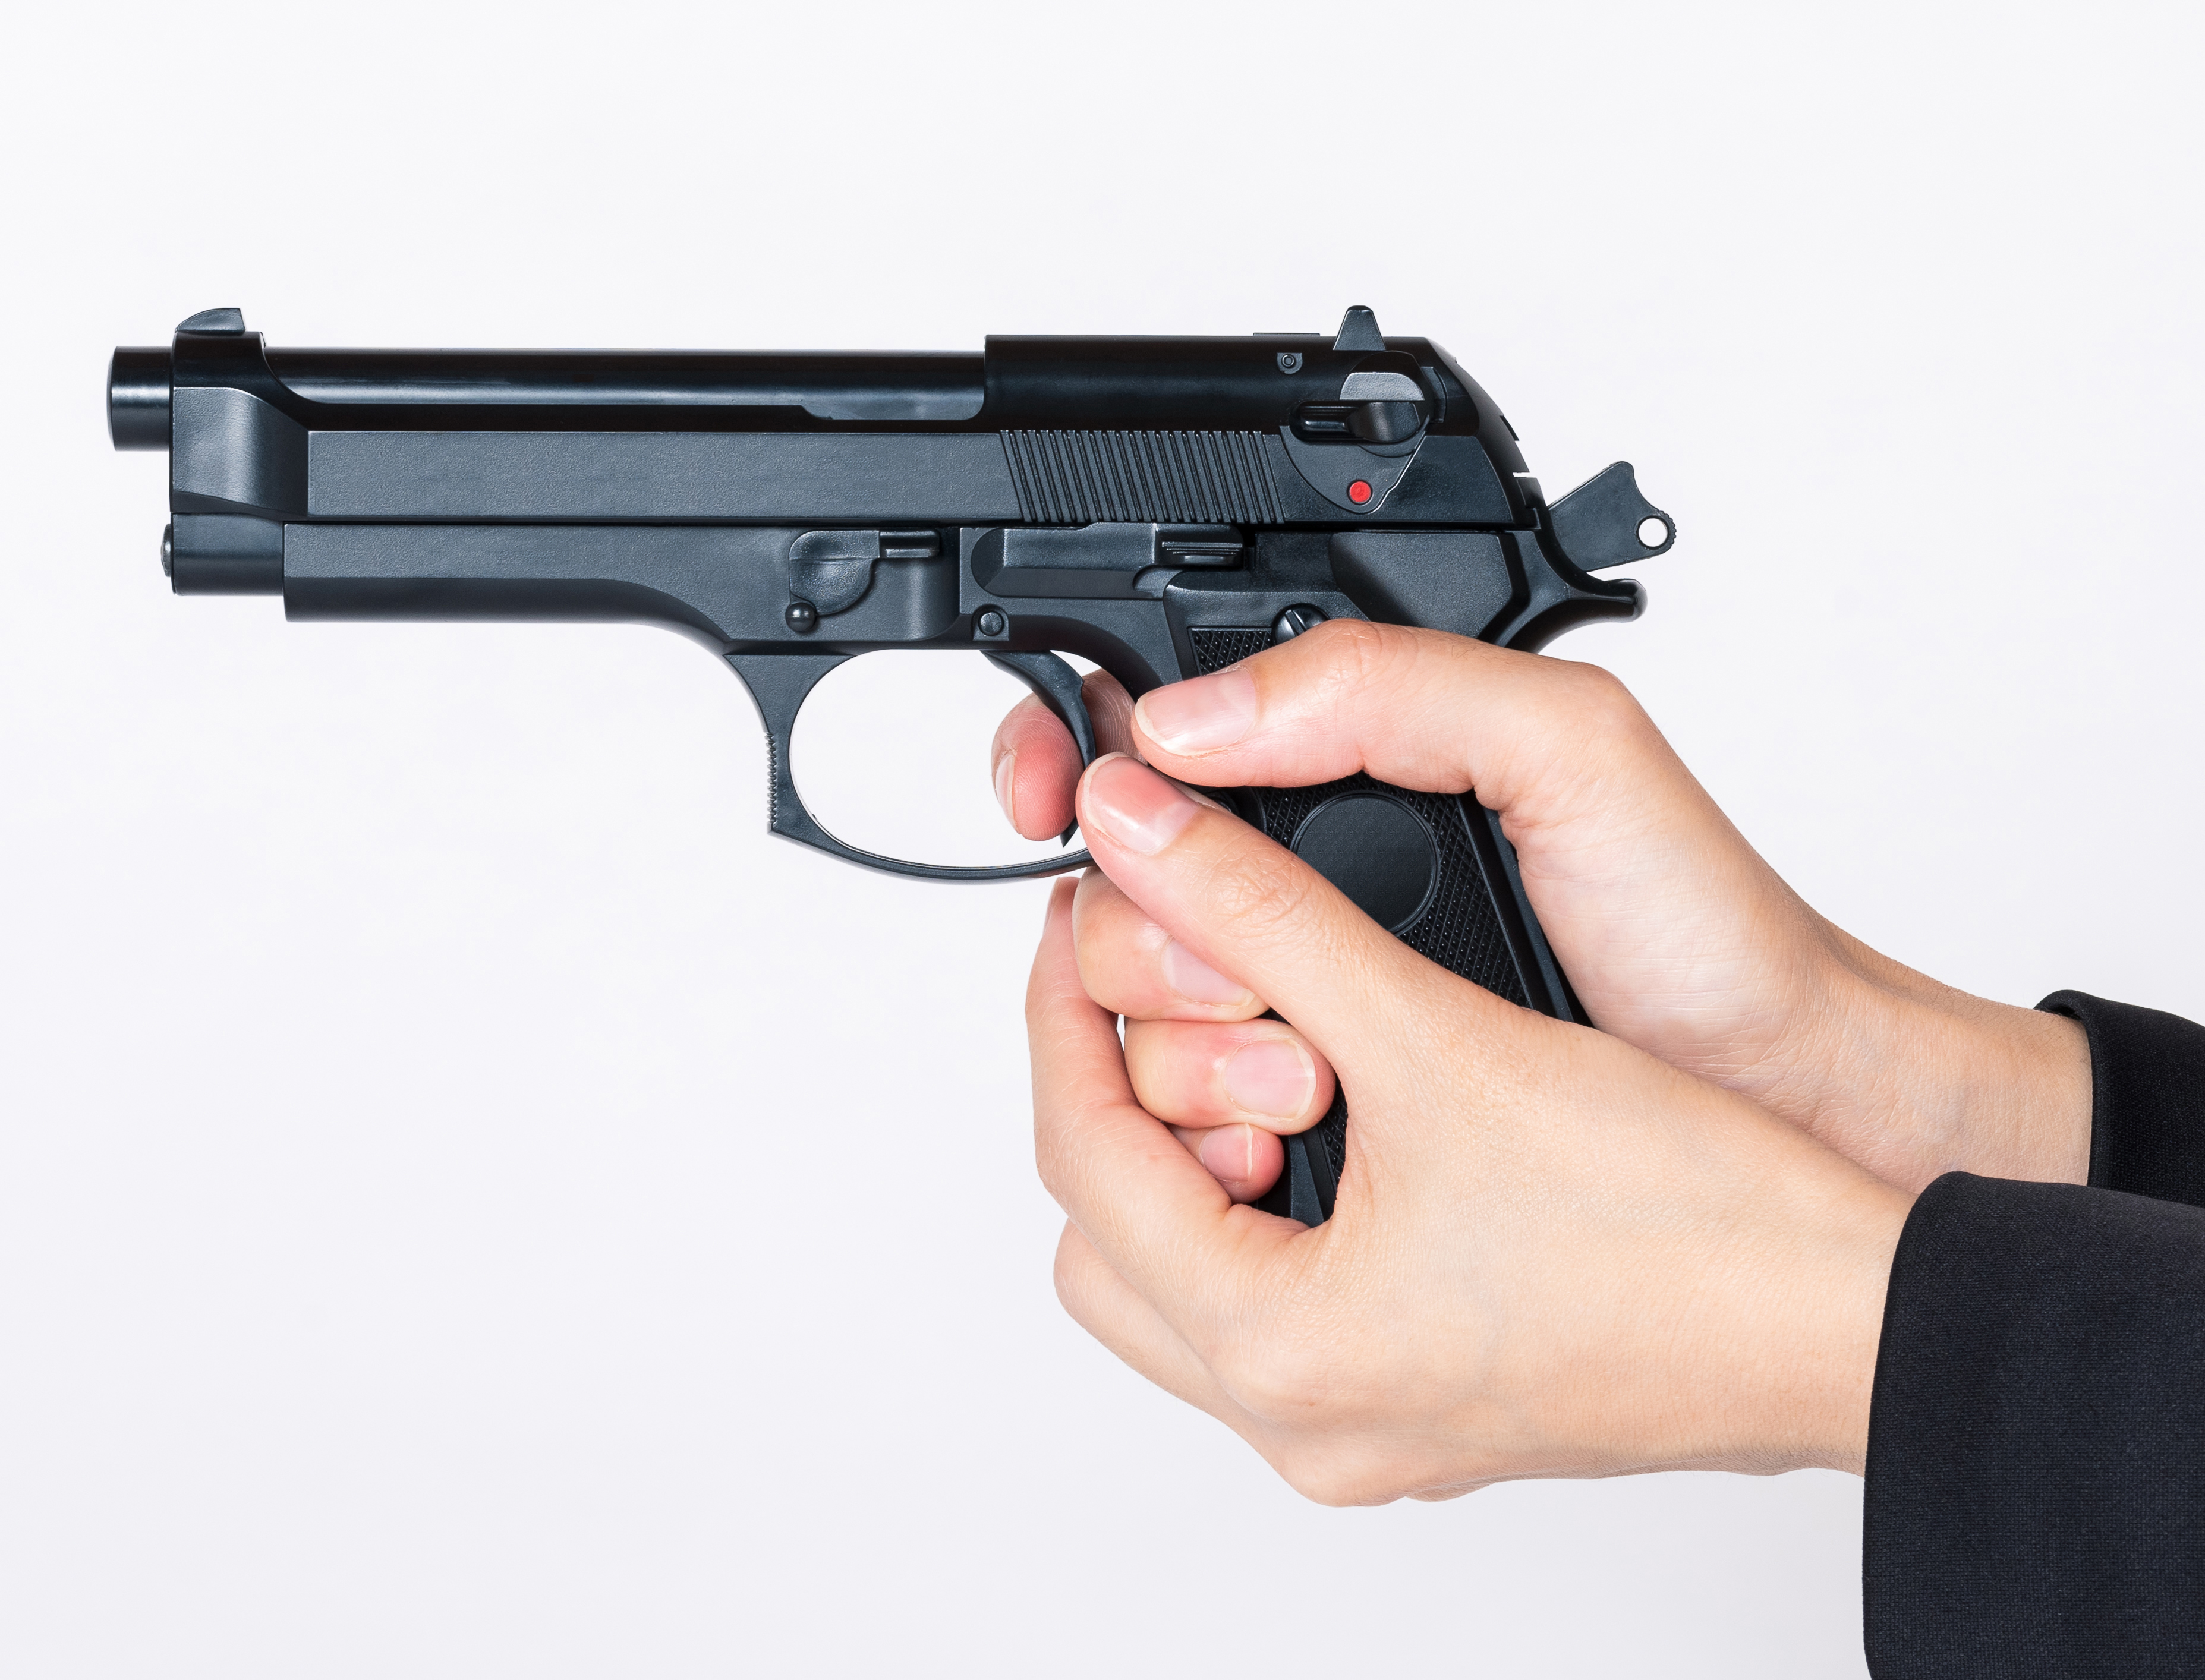 【六代目山口組高山若頭出所前】山健組事務所前発砲2名死亡について今後の行方【神戸山口組】